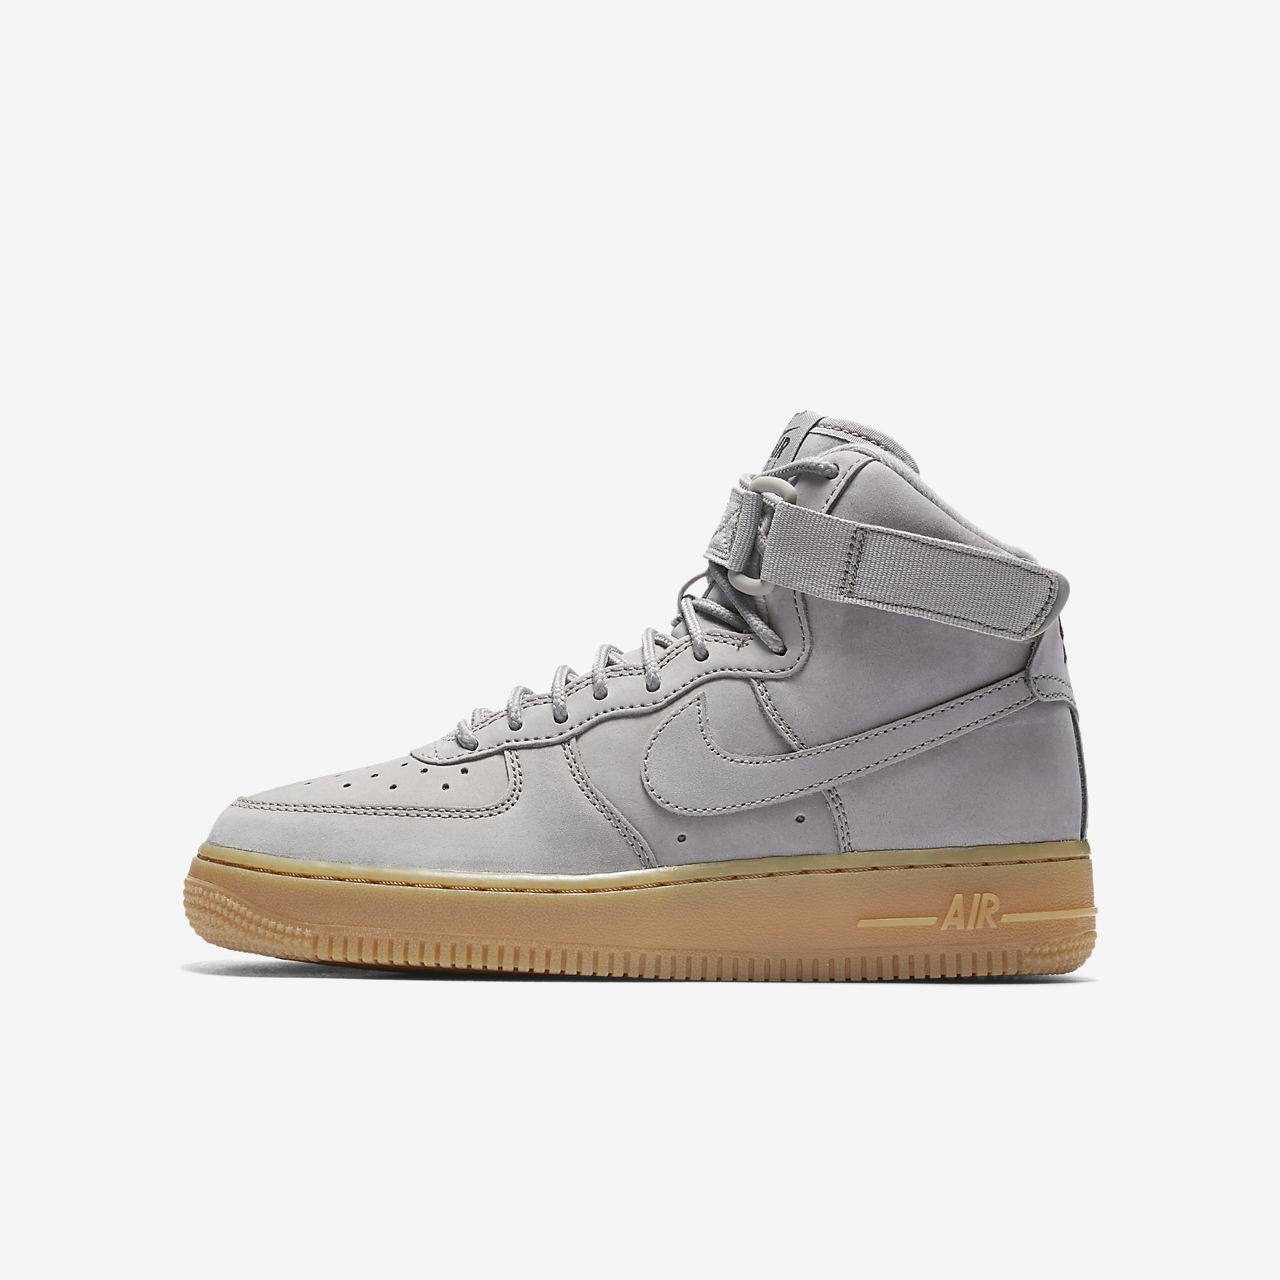 1d141cb659376c Nike Air Force 1 High WB Big Kids  Shoe